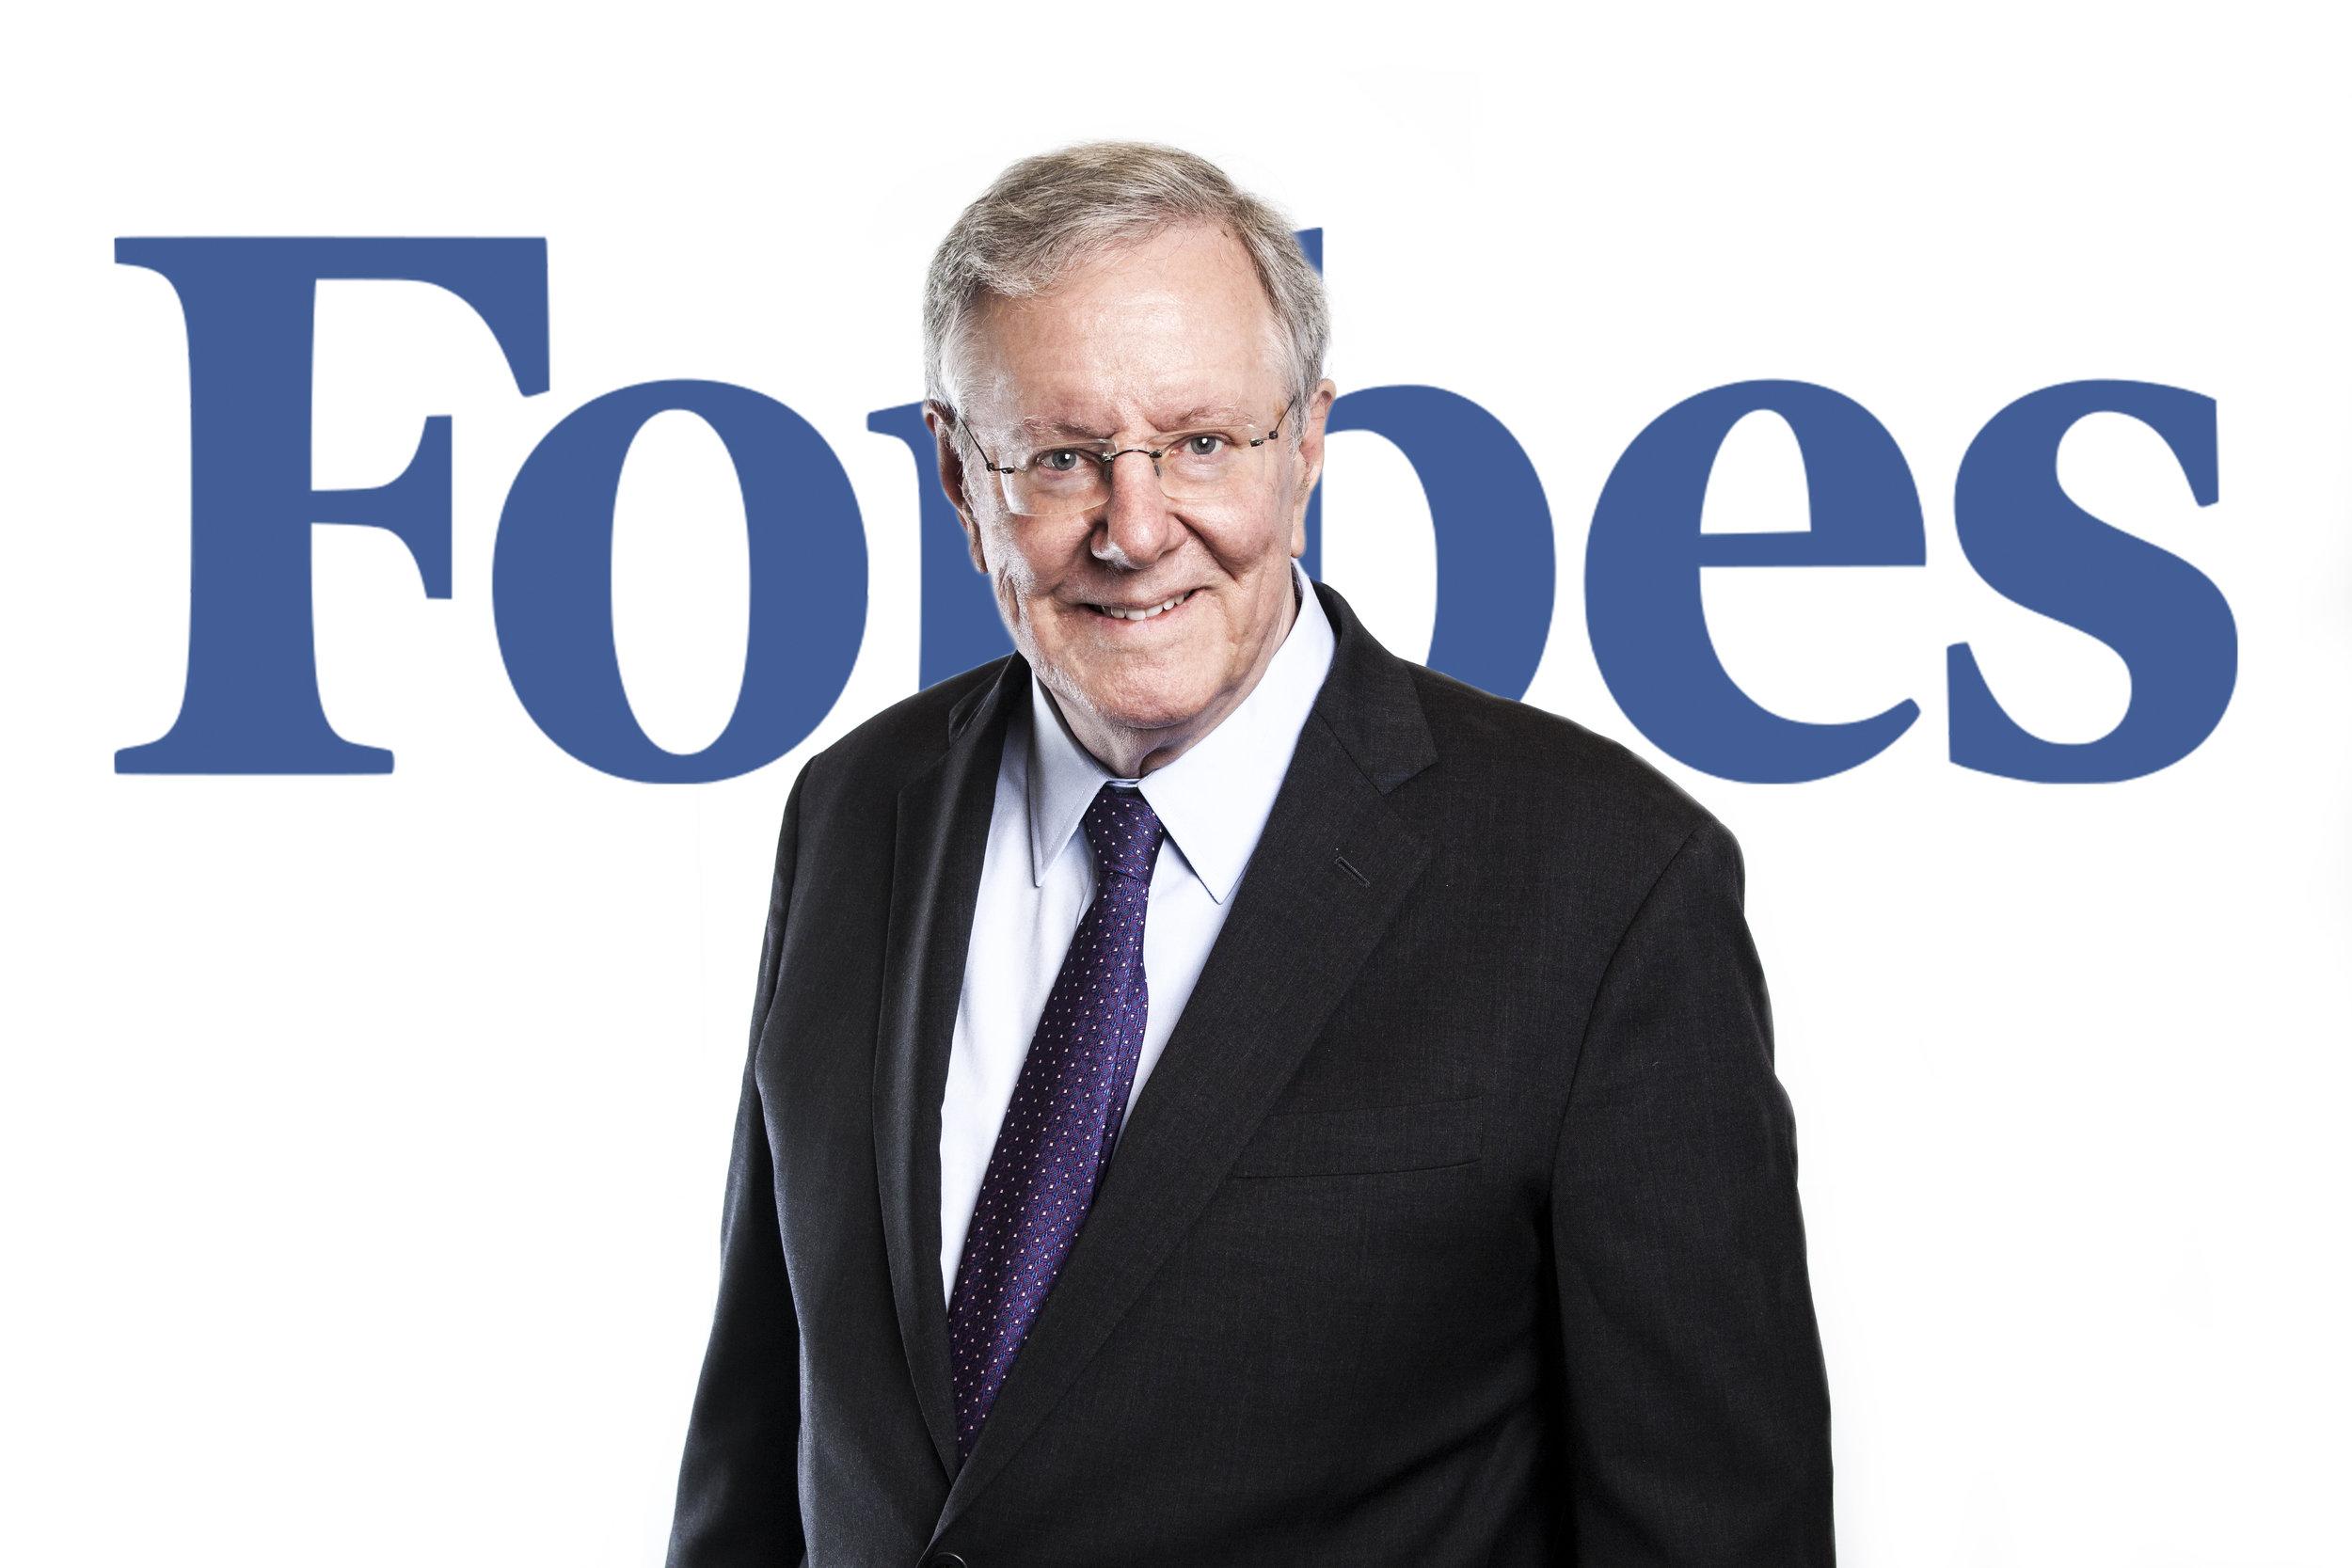 Steve Forbes, Forbes Magazine